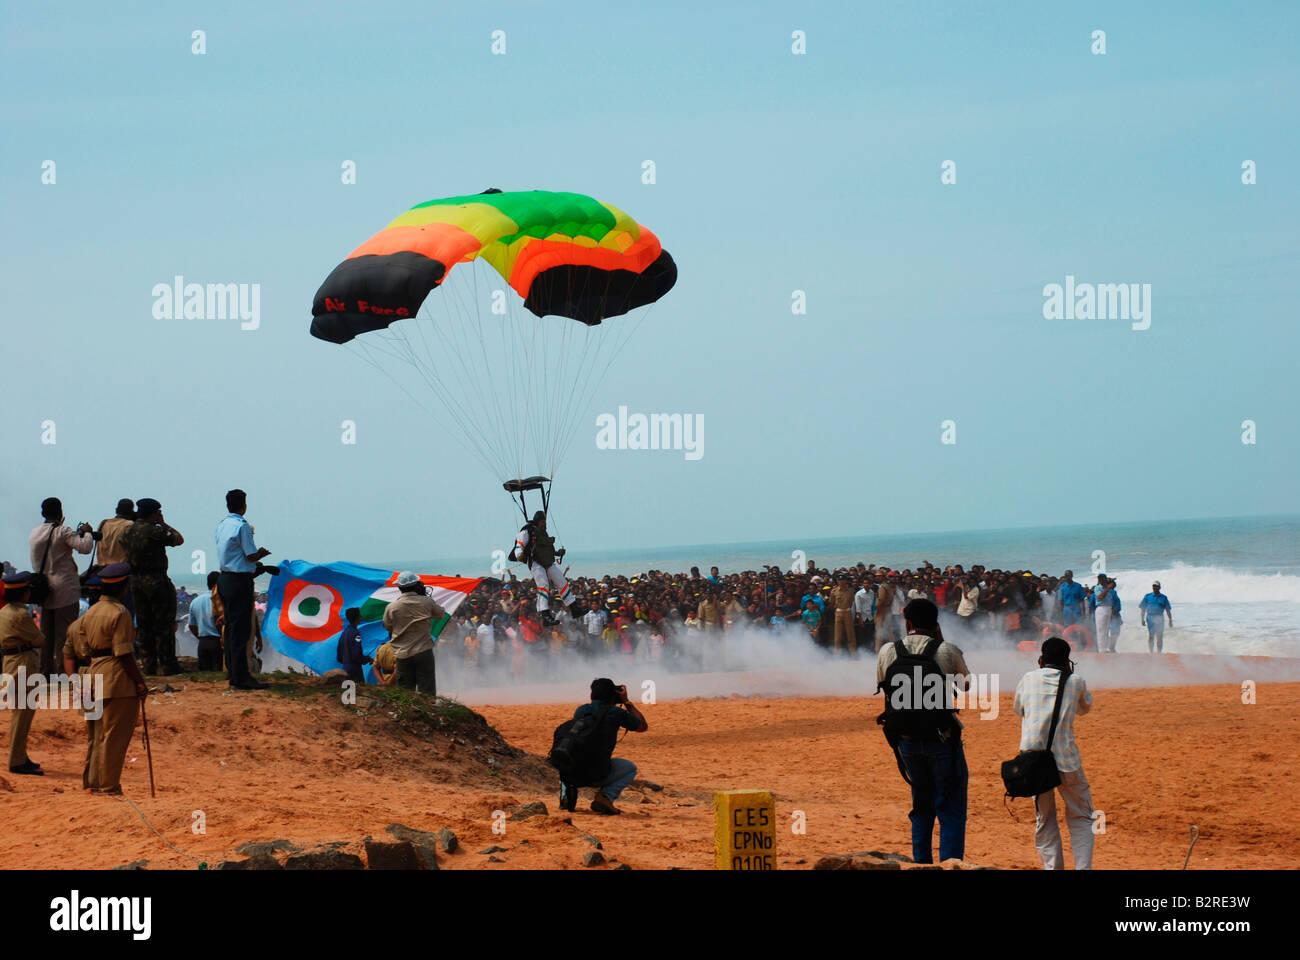 Indian paratrooper landing in a beach at Trivandrum,Kerala,India - Stock Image